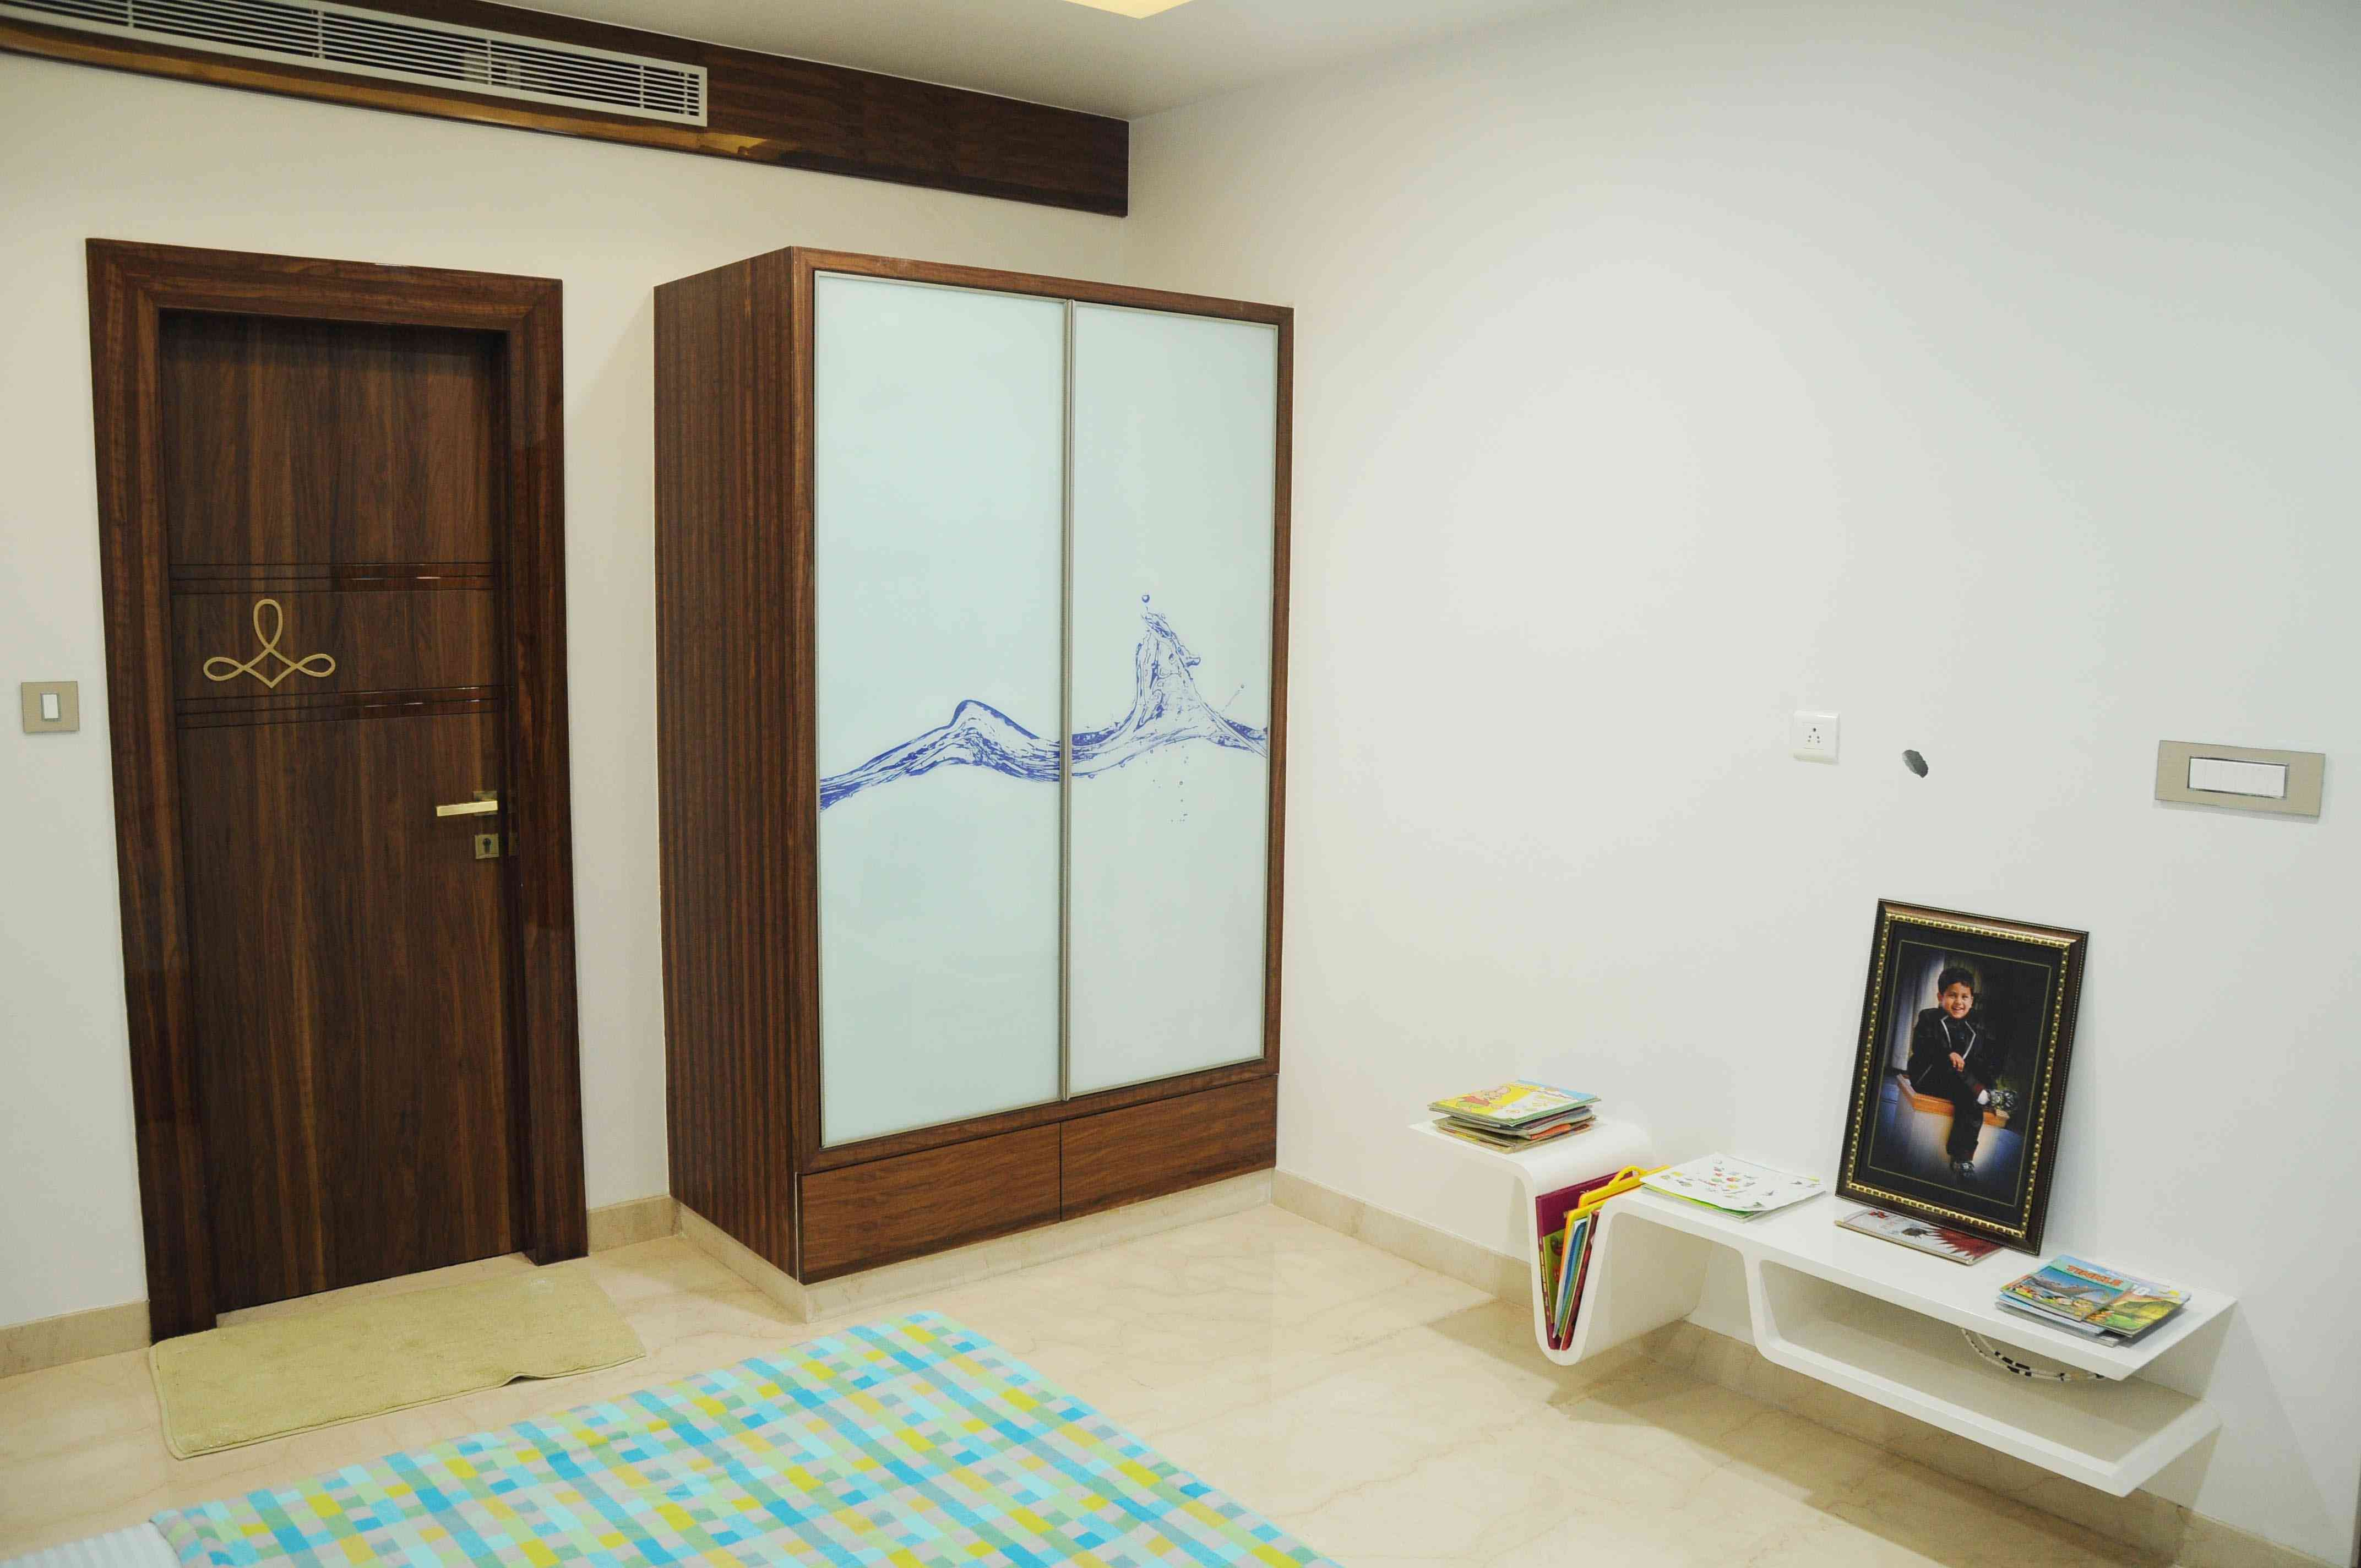 Kids Bedroom Design By Samanth Gowda Architect In Hyderabad Andhra Pradesh India